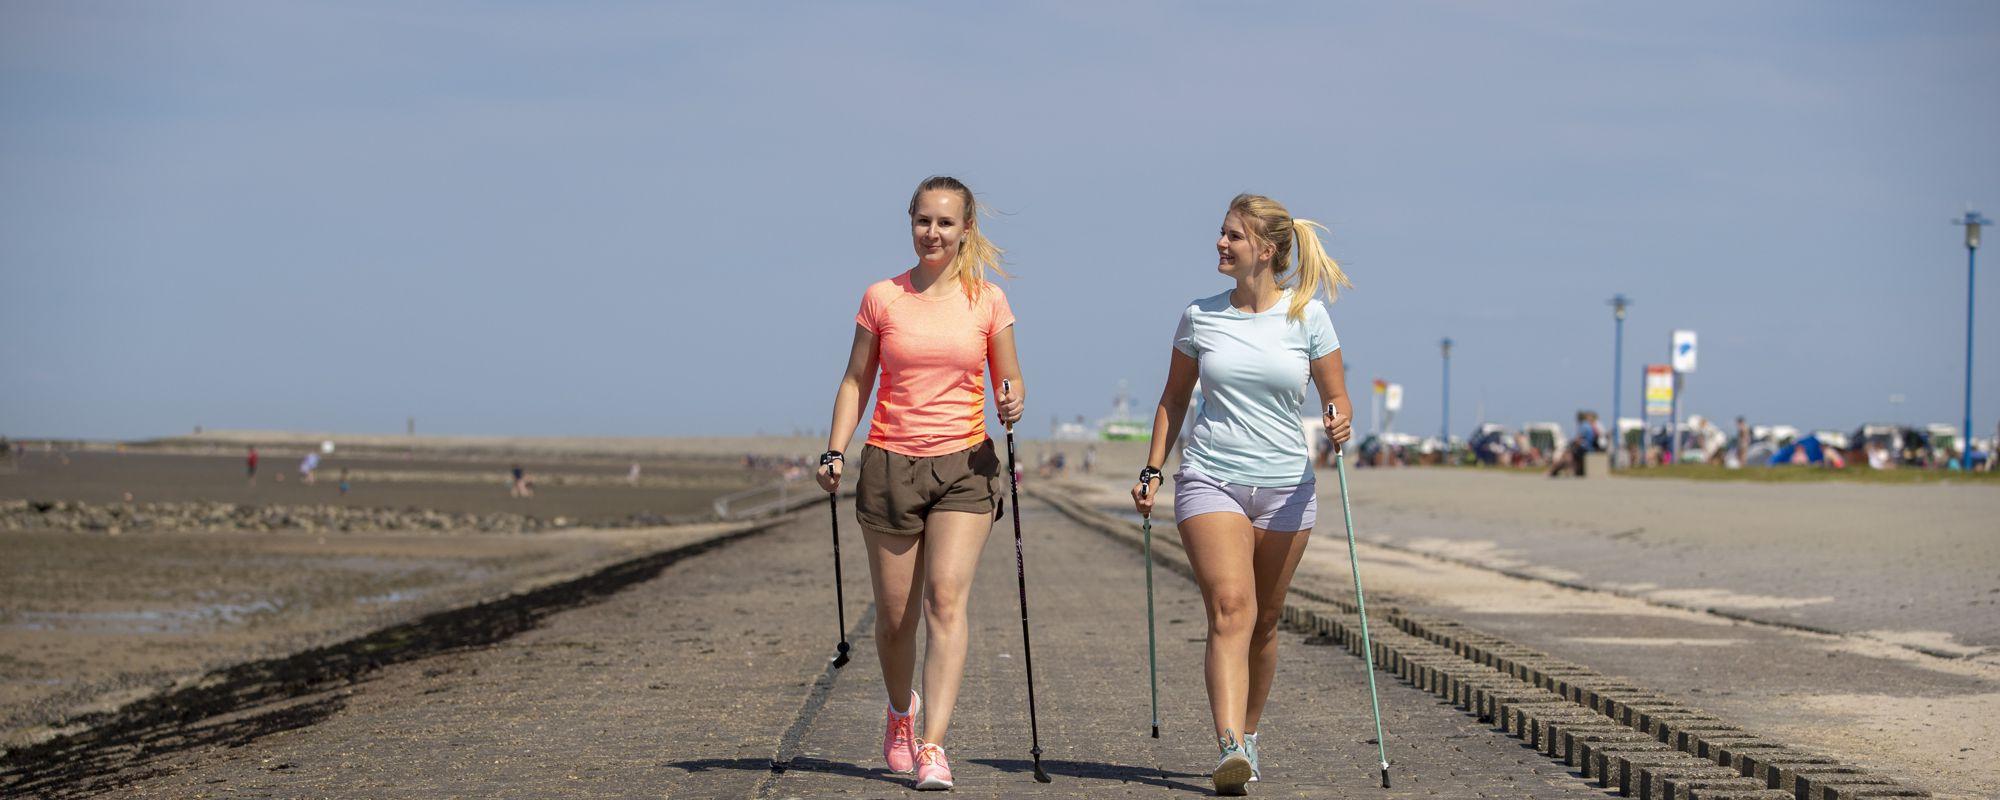 Aktiv draußen - Nordic Walking am Strand